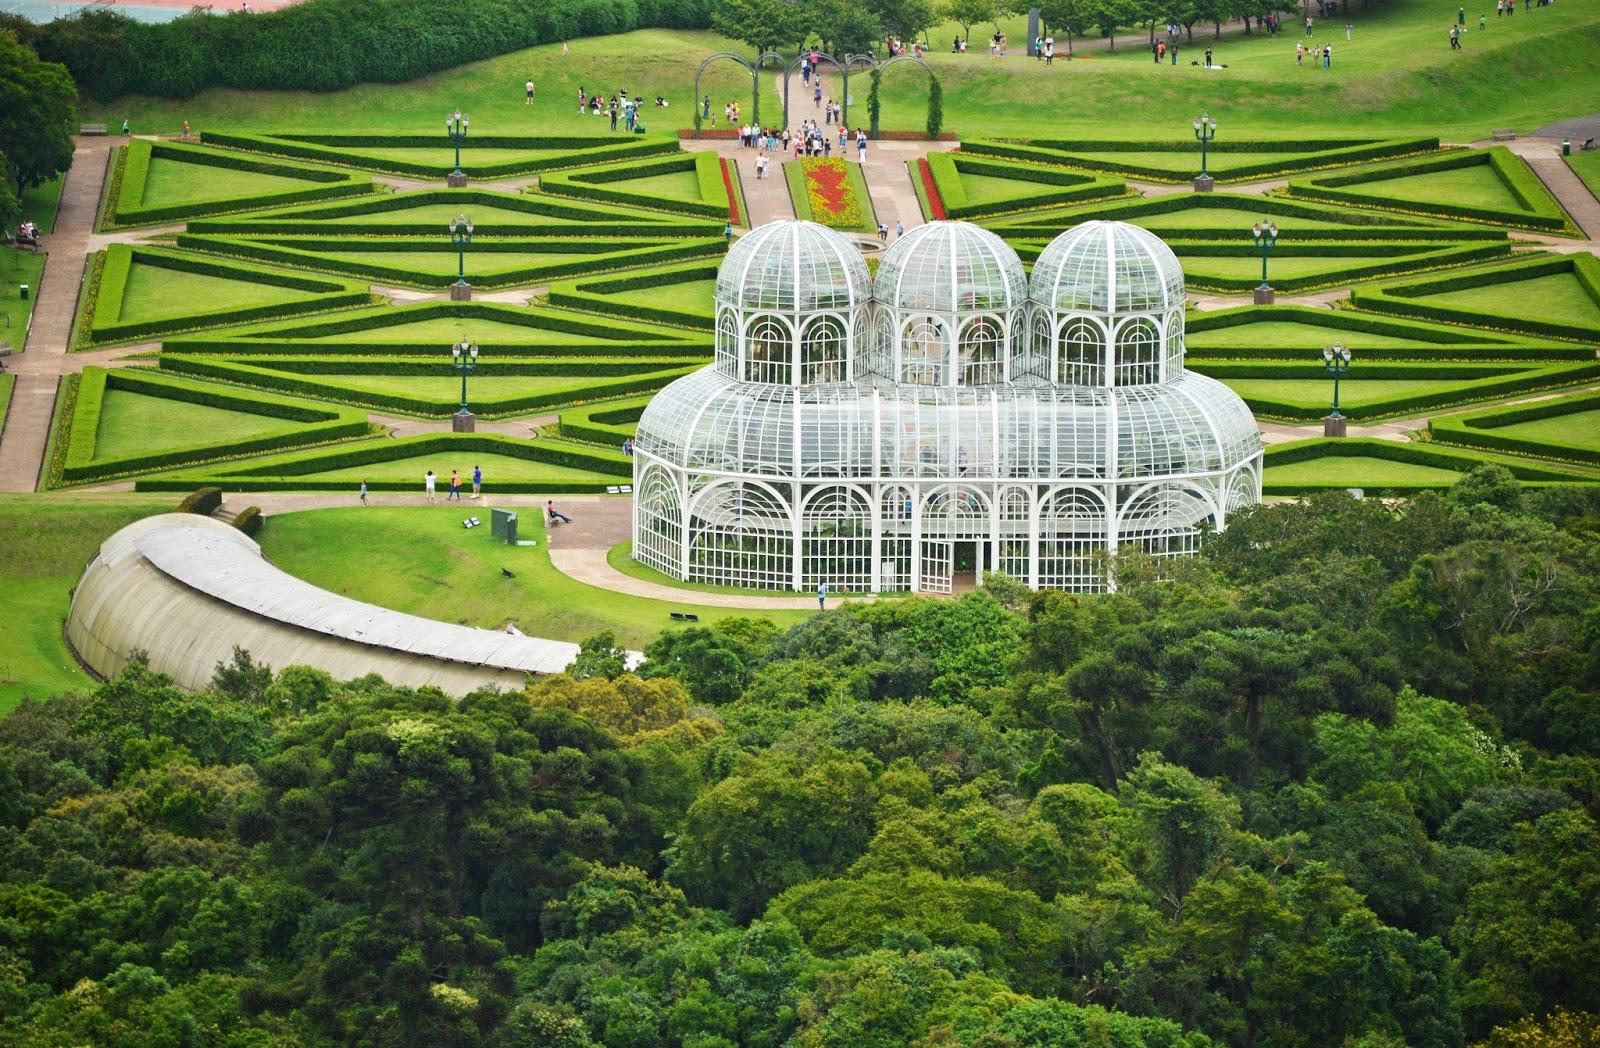 Nag on the Lake Aerial Views of Landscape Design